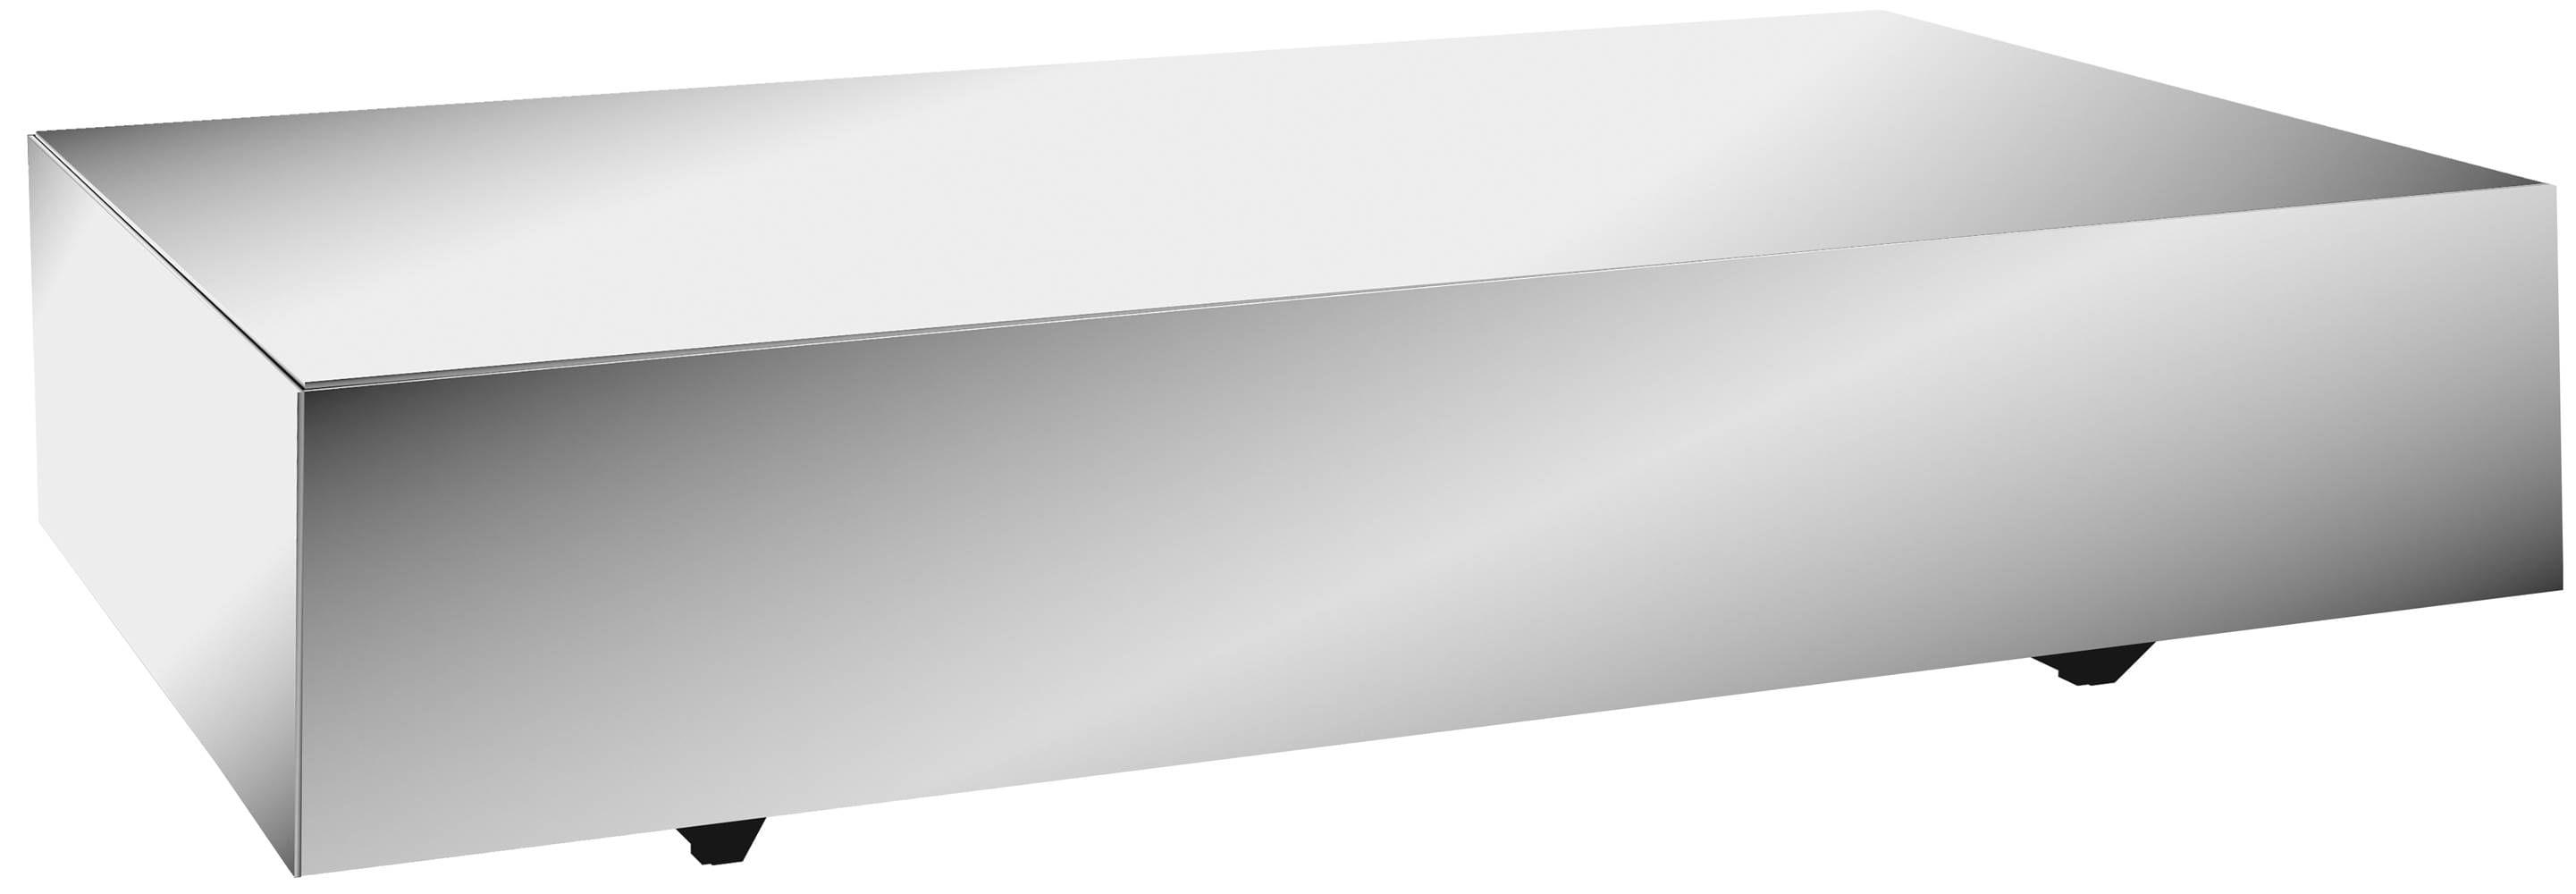 Mesa de Centro Cubo Espelhada - 48015